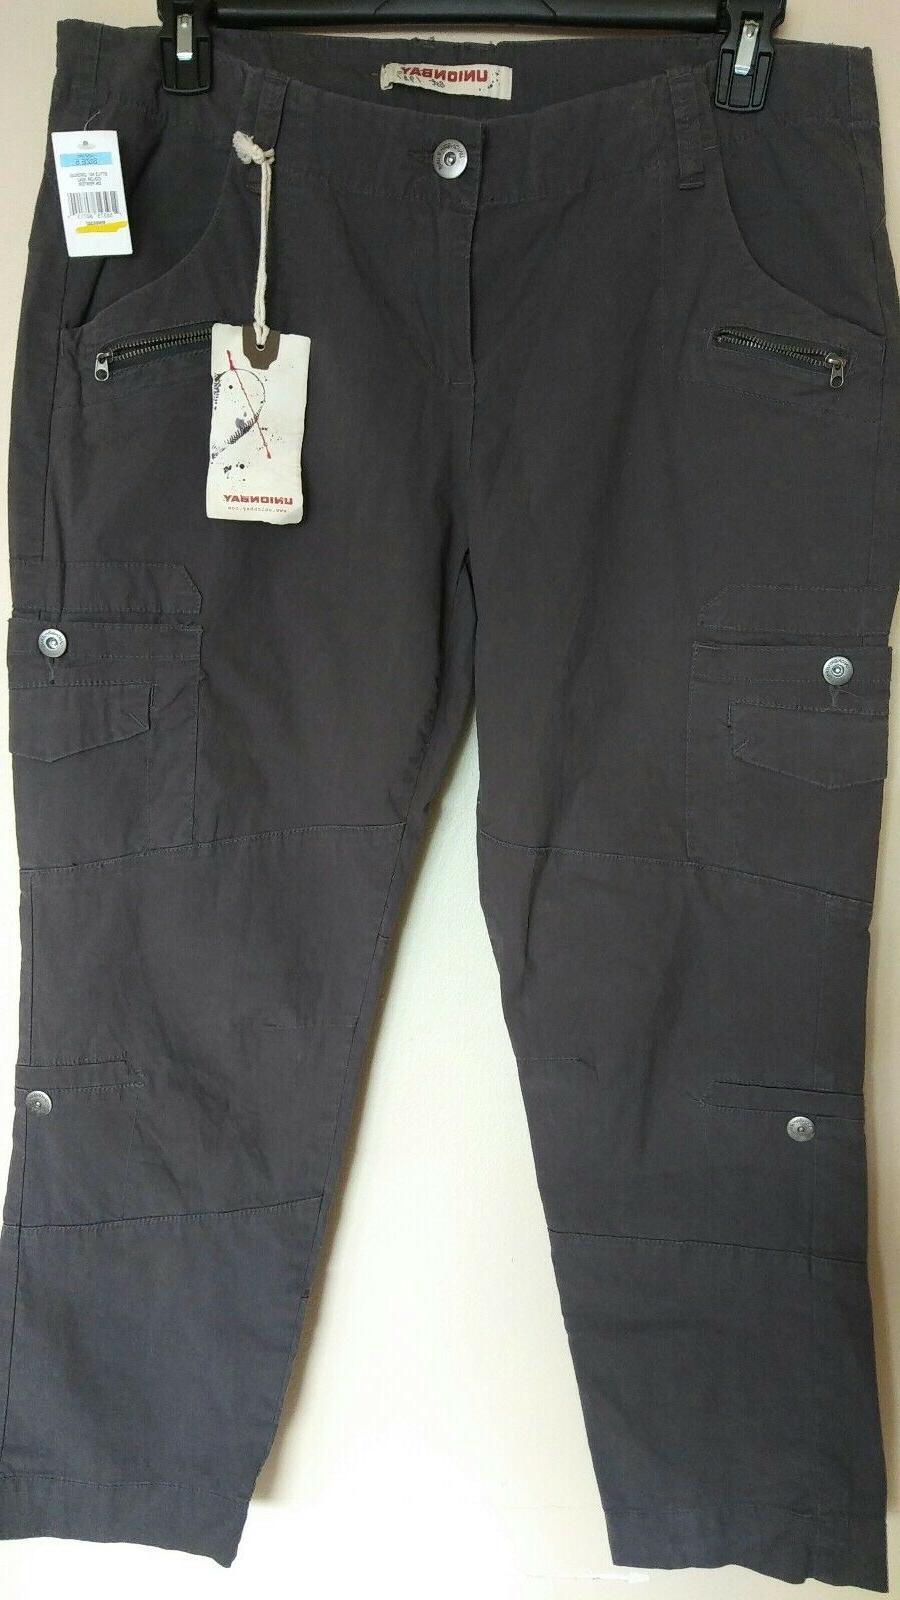 NWT Women's Junior Unionbay Cargo Pants Gray sz 5 inseam 26